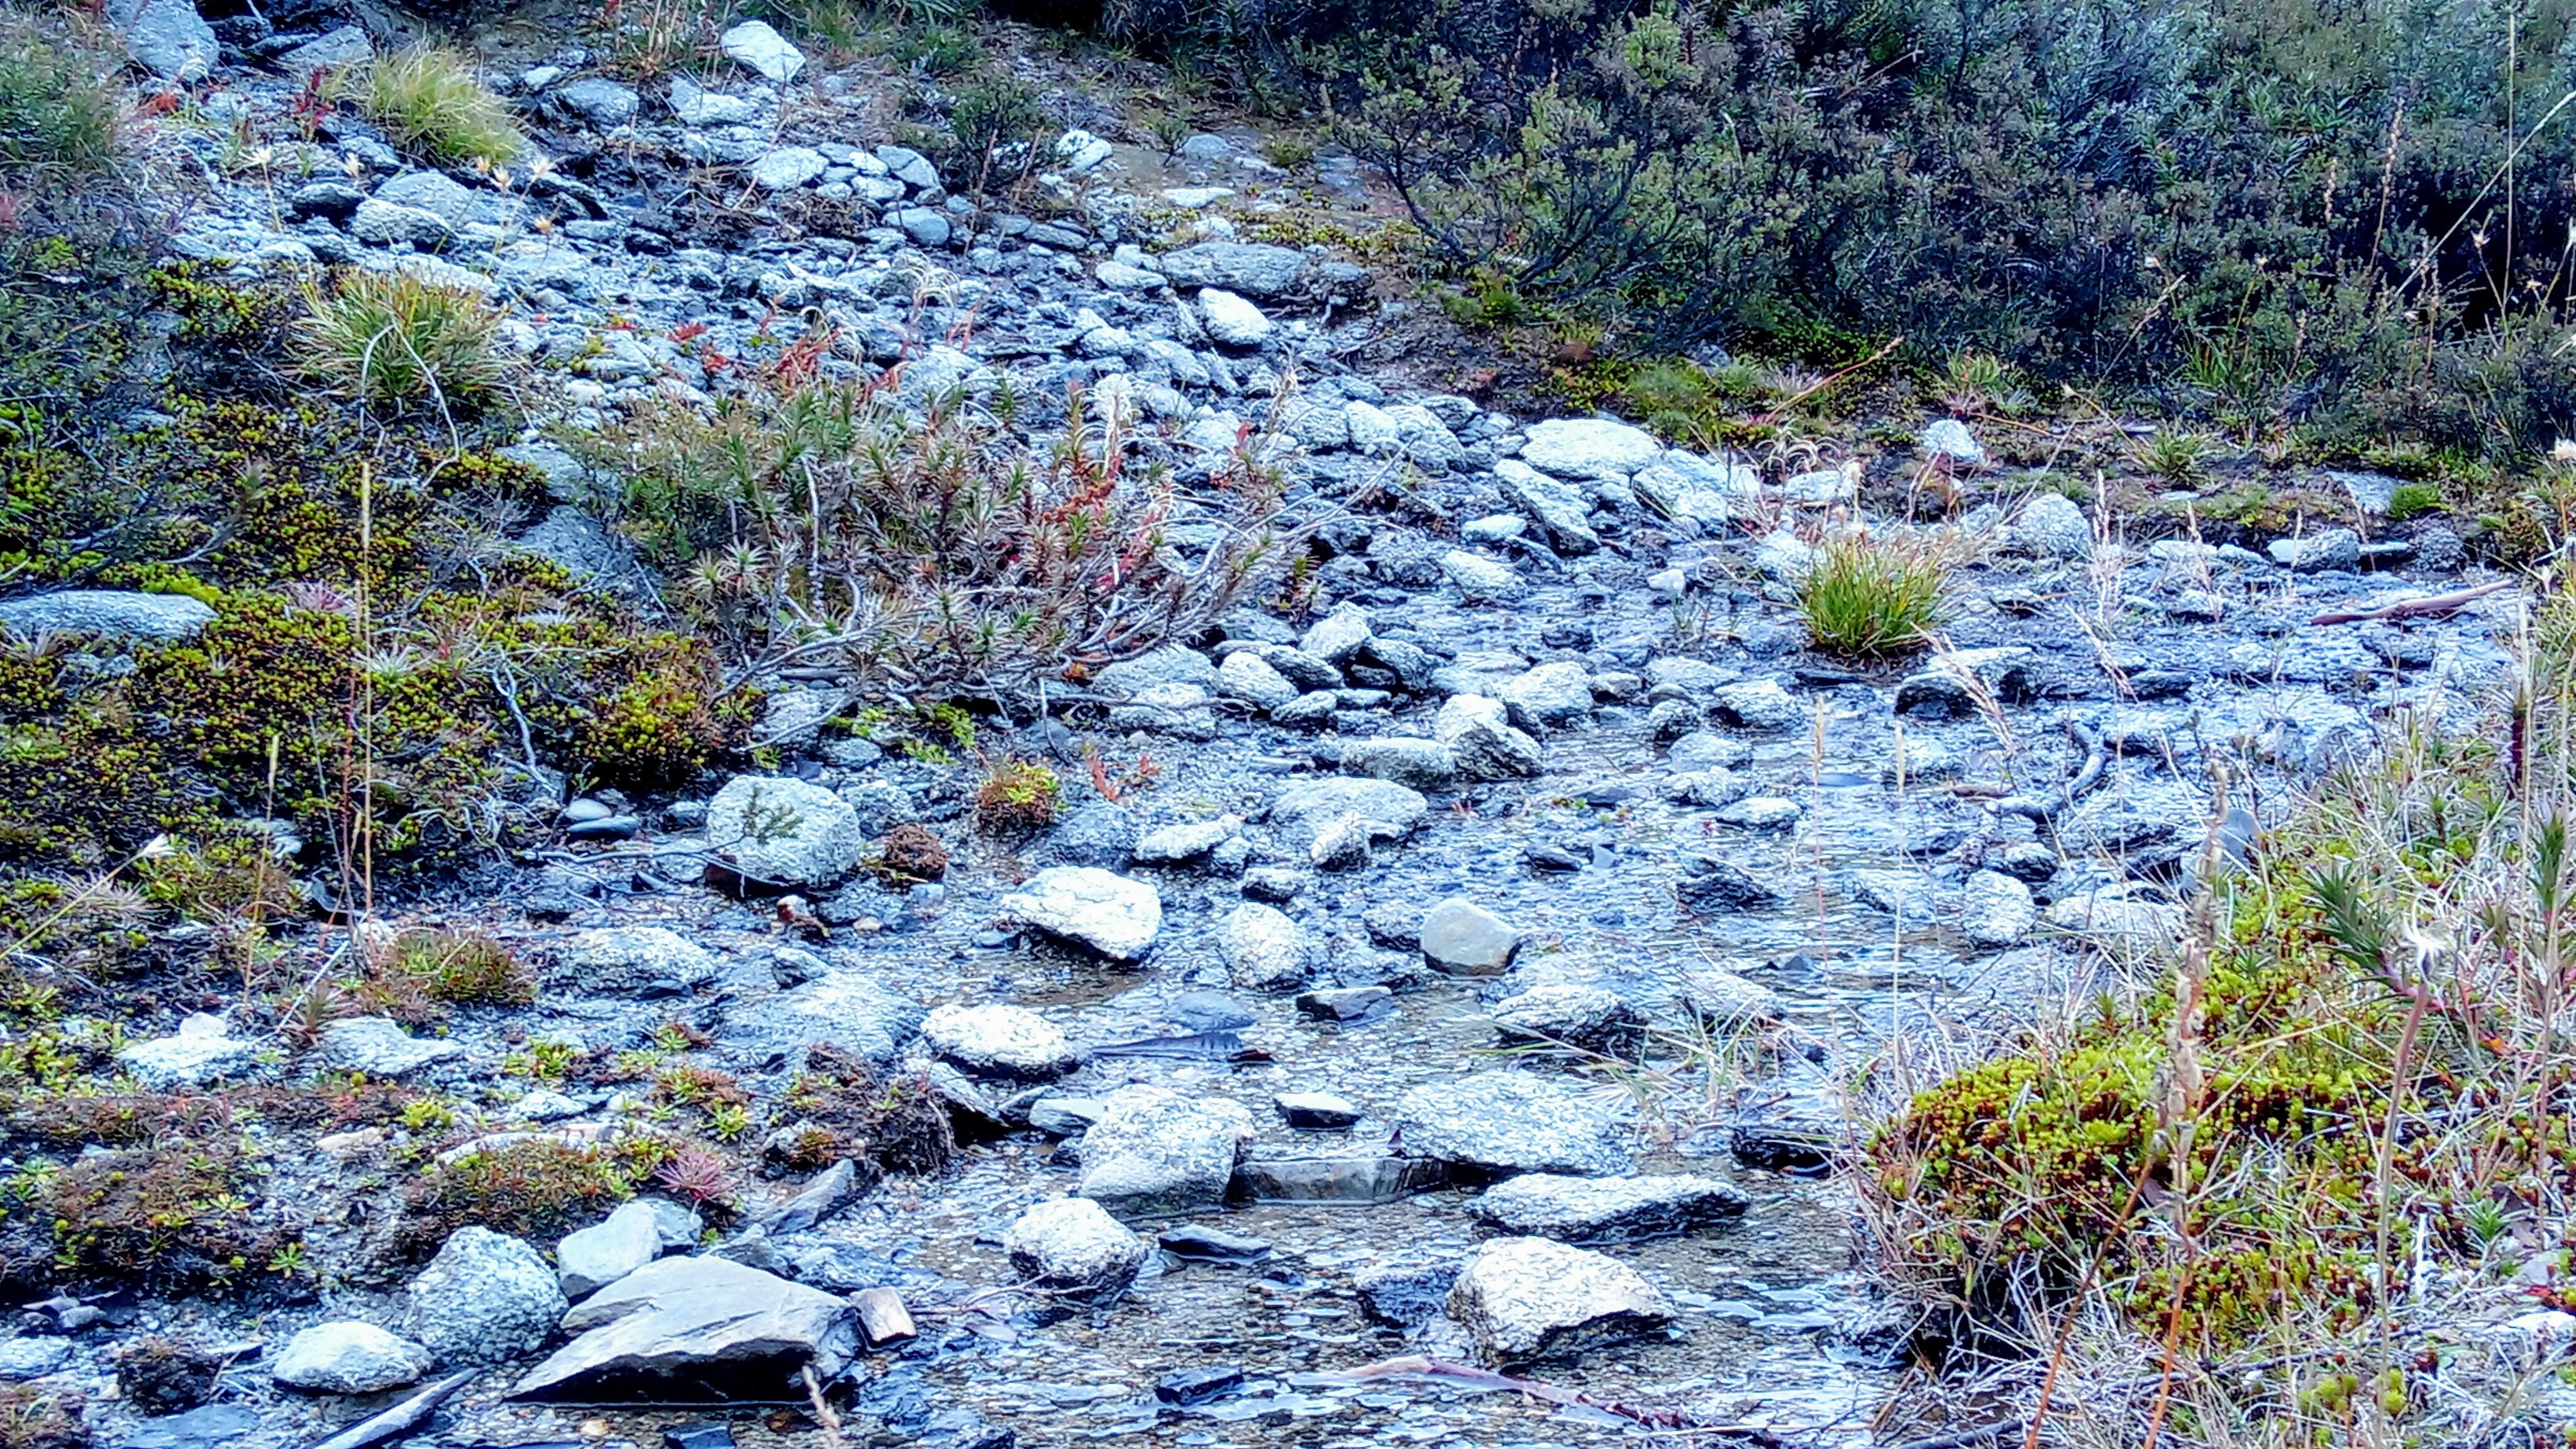 File:Stream of Rocks jpg - Wikimedia Commons